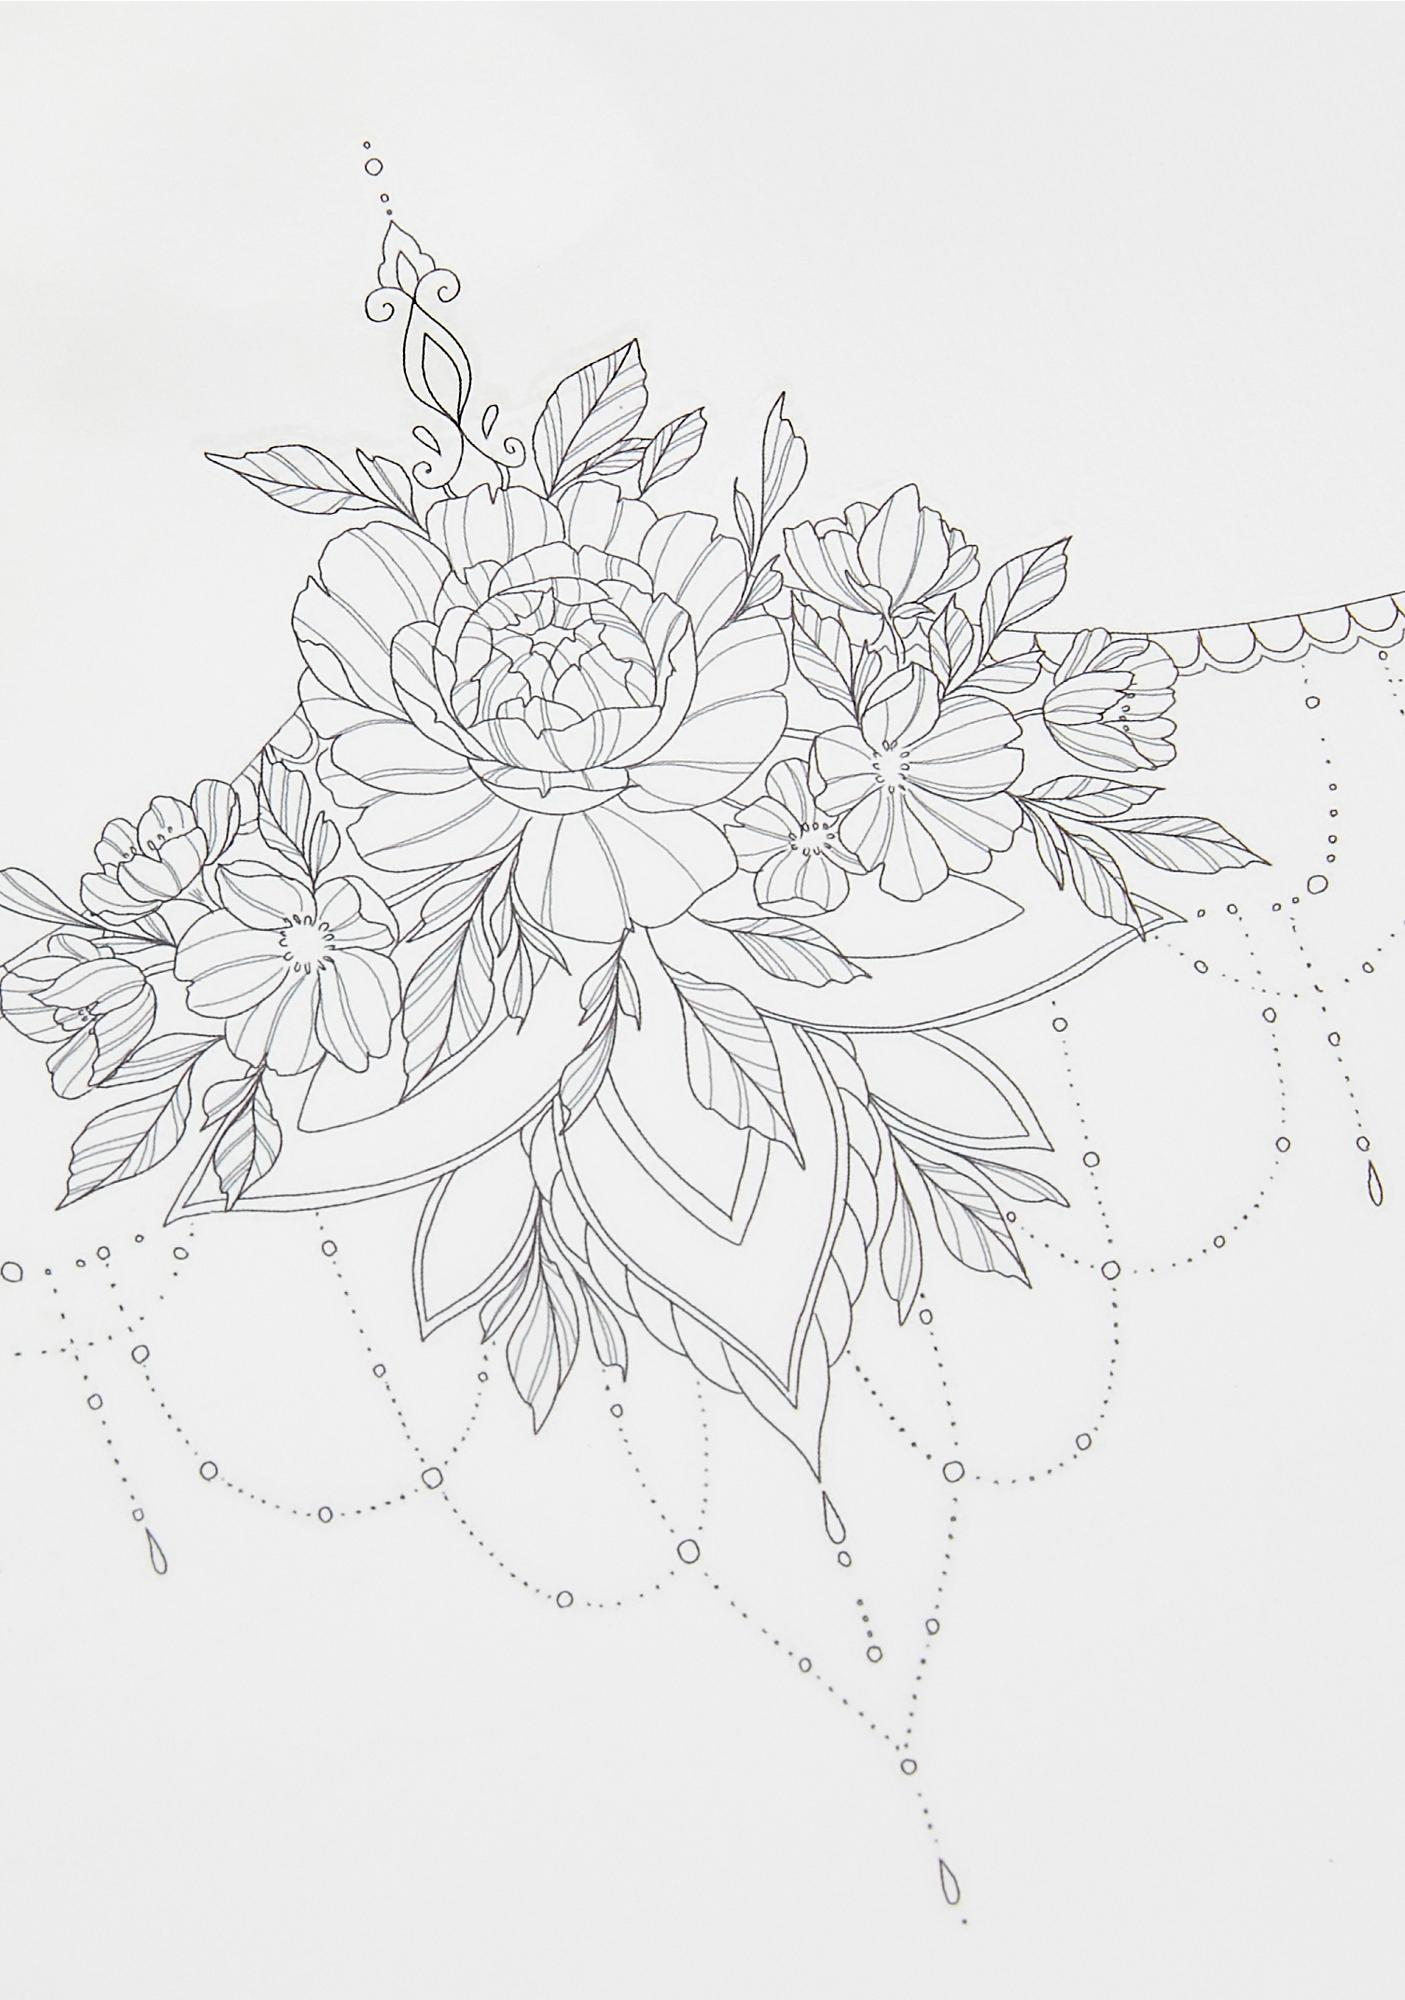 SHRINE x Sophie Rimmer Body Tattoo